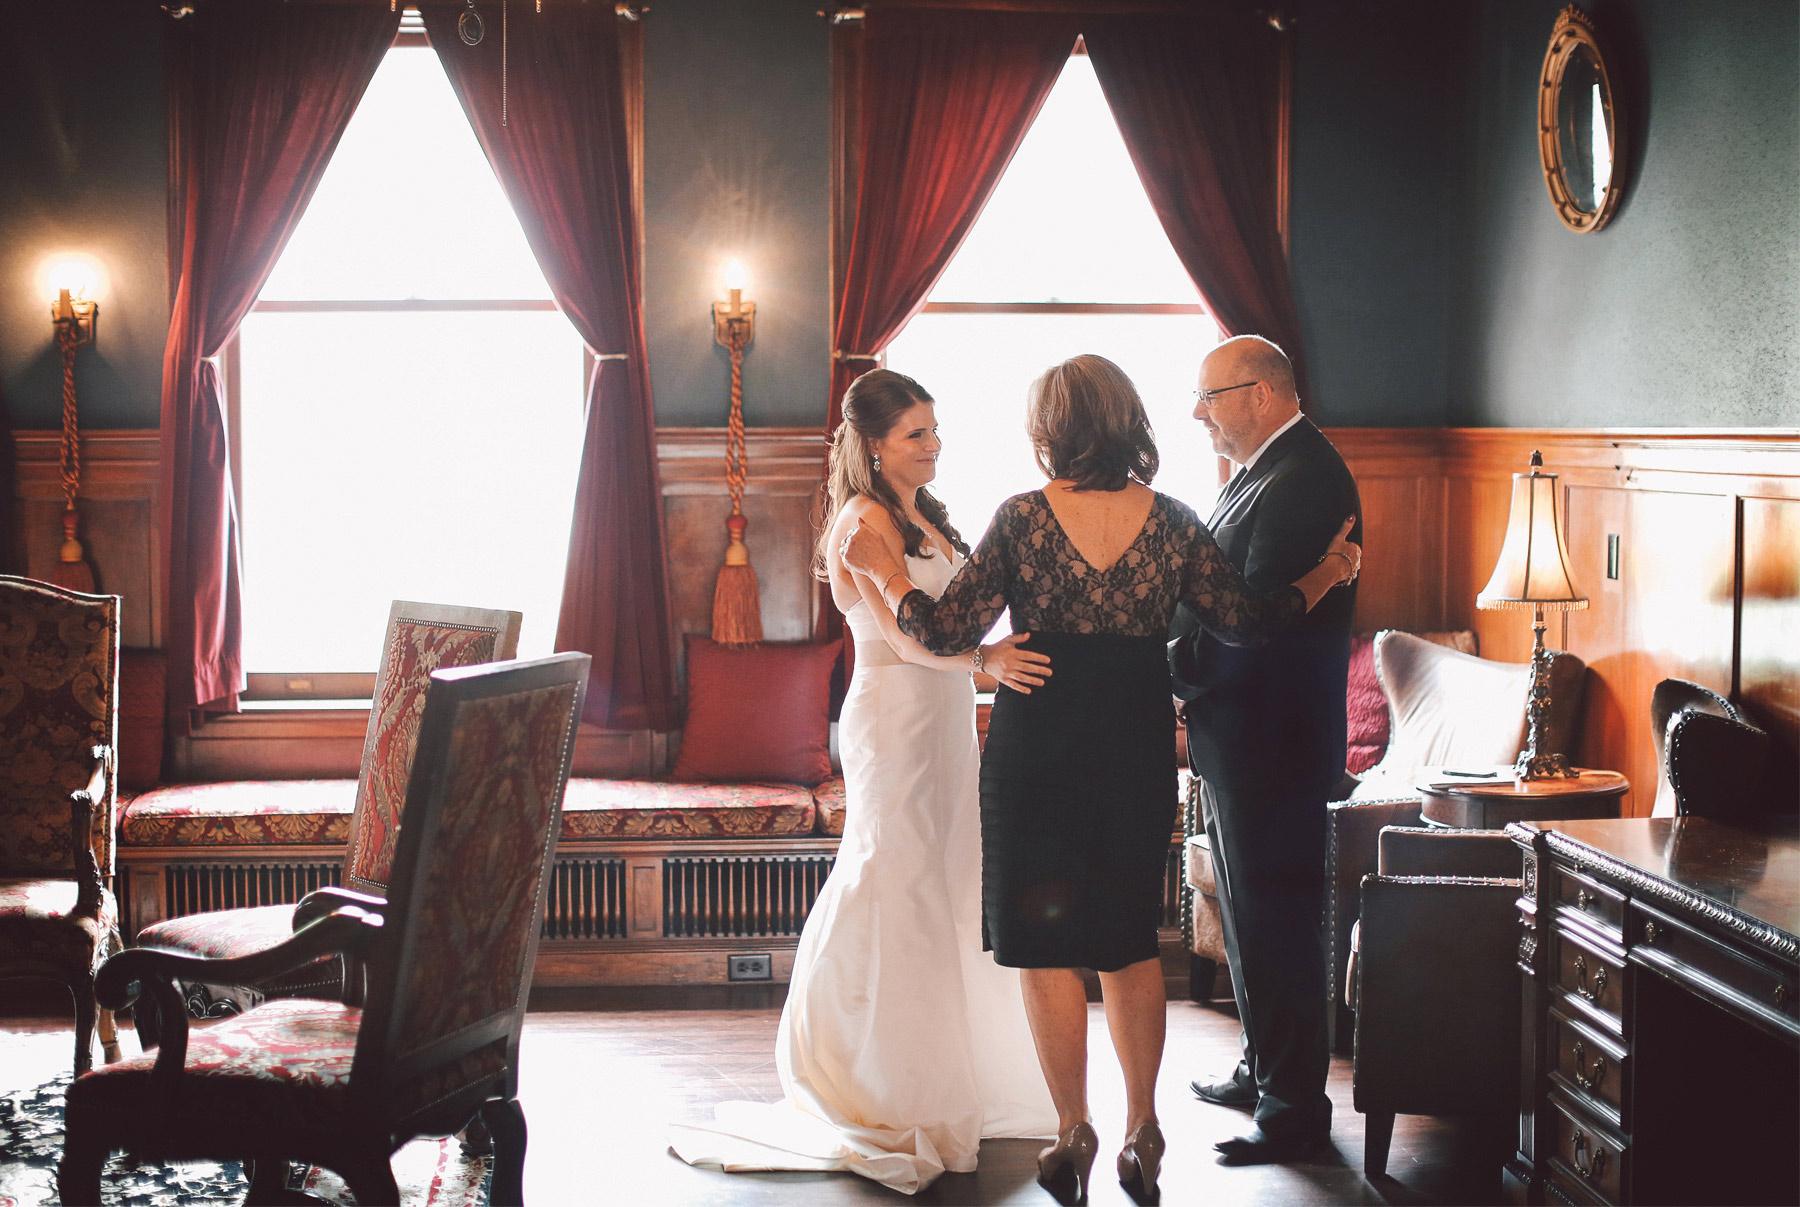 02-Minneapolis-Minnesota-Wedding-Photography-by-Vick-Photography-Semple-Mansion-Bridal-Suite-Nikki-and-Matt.jpg